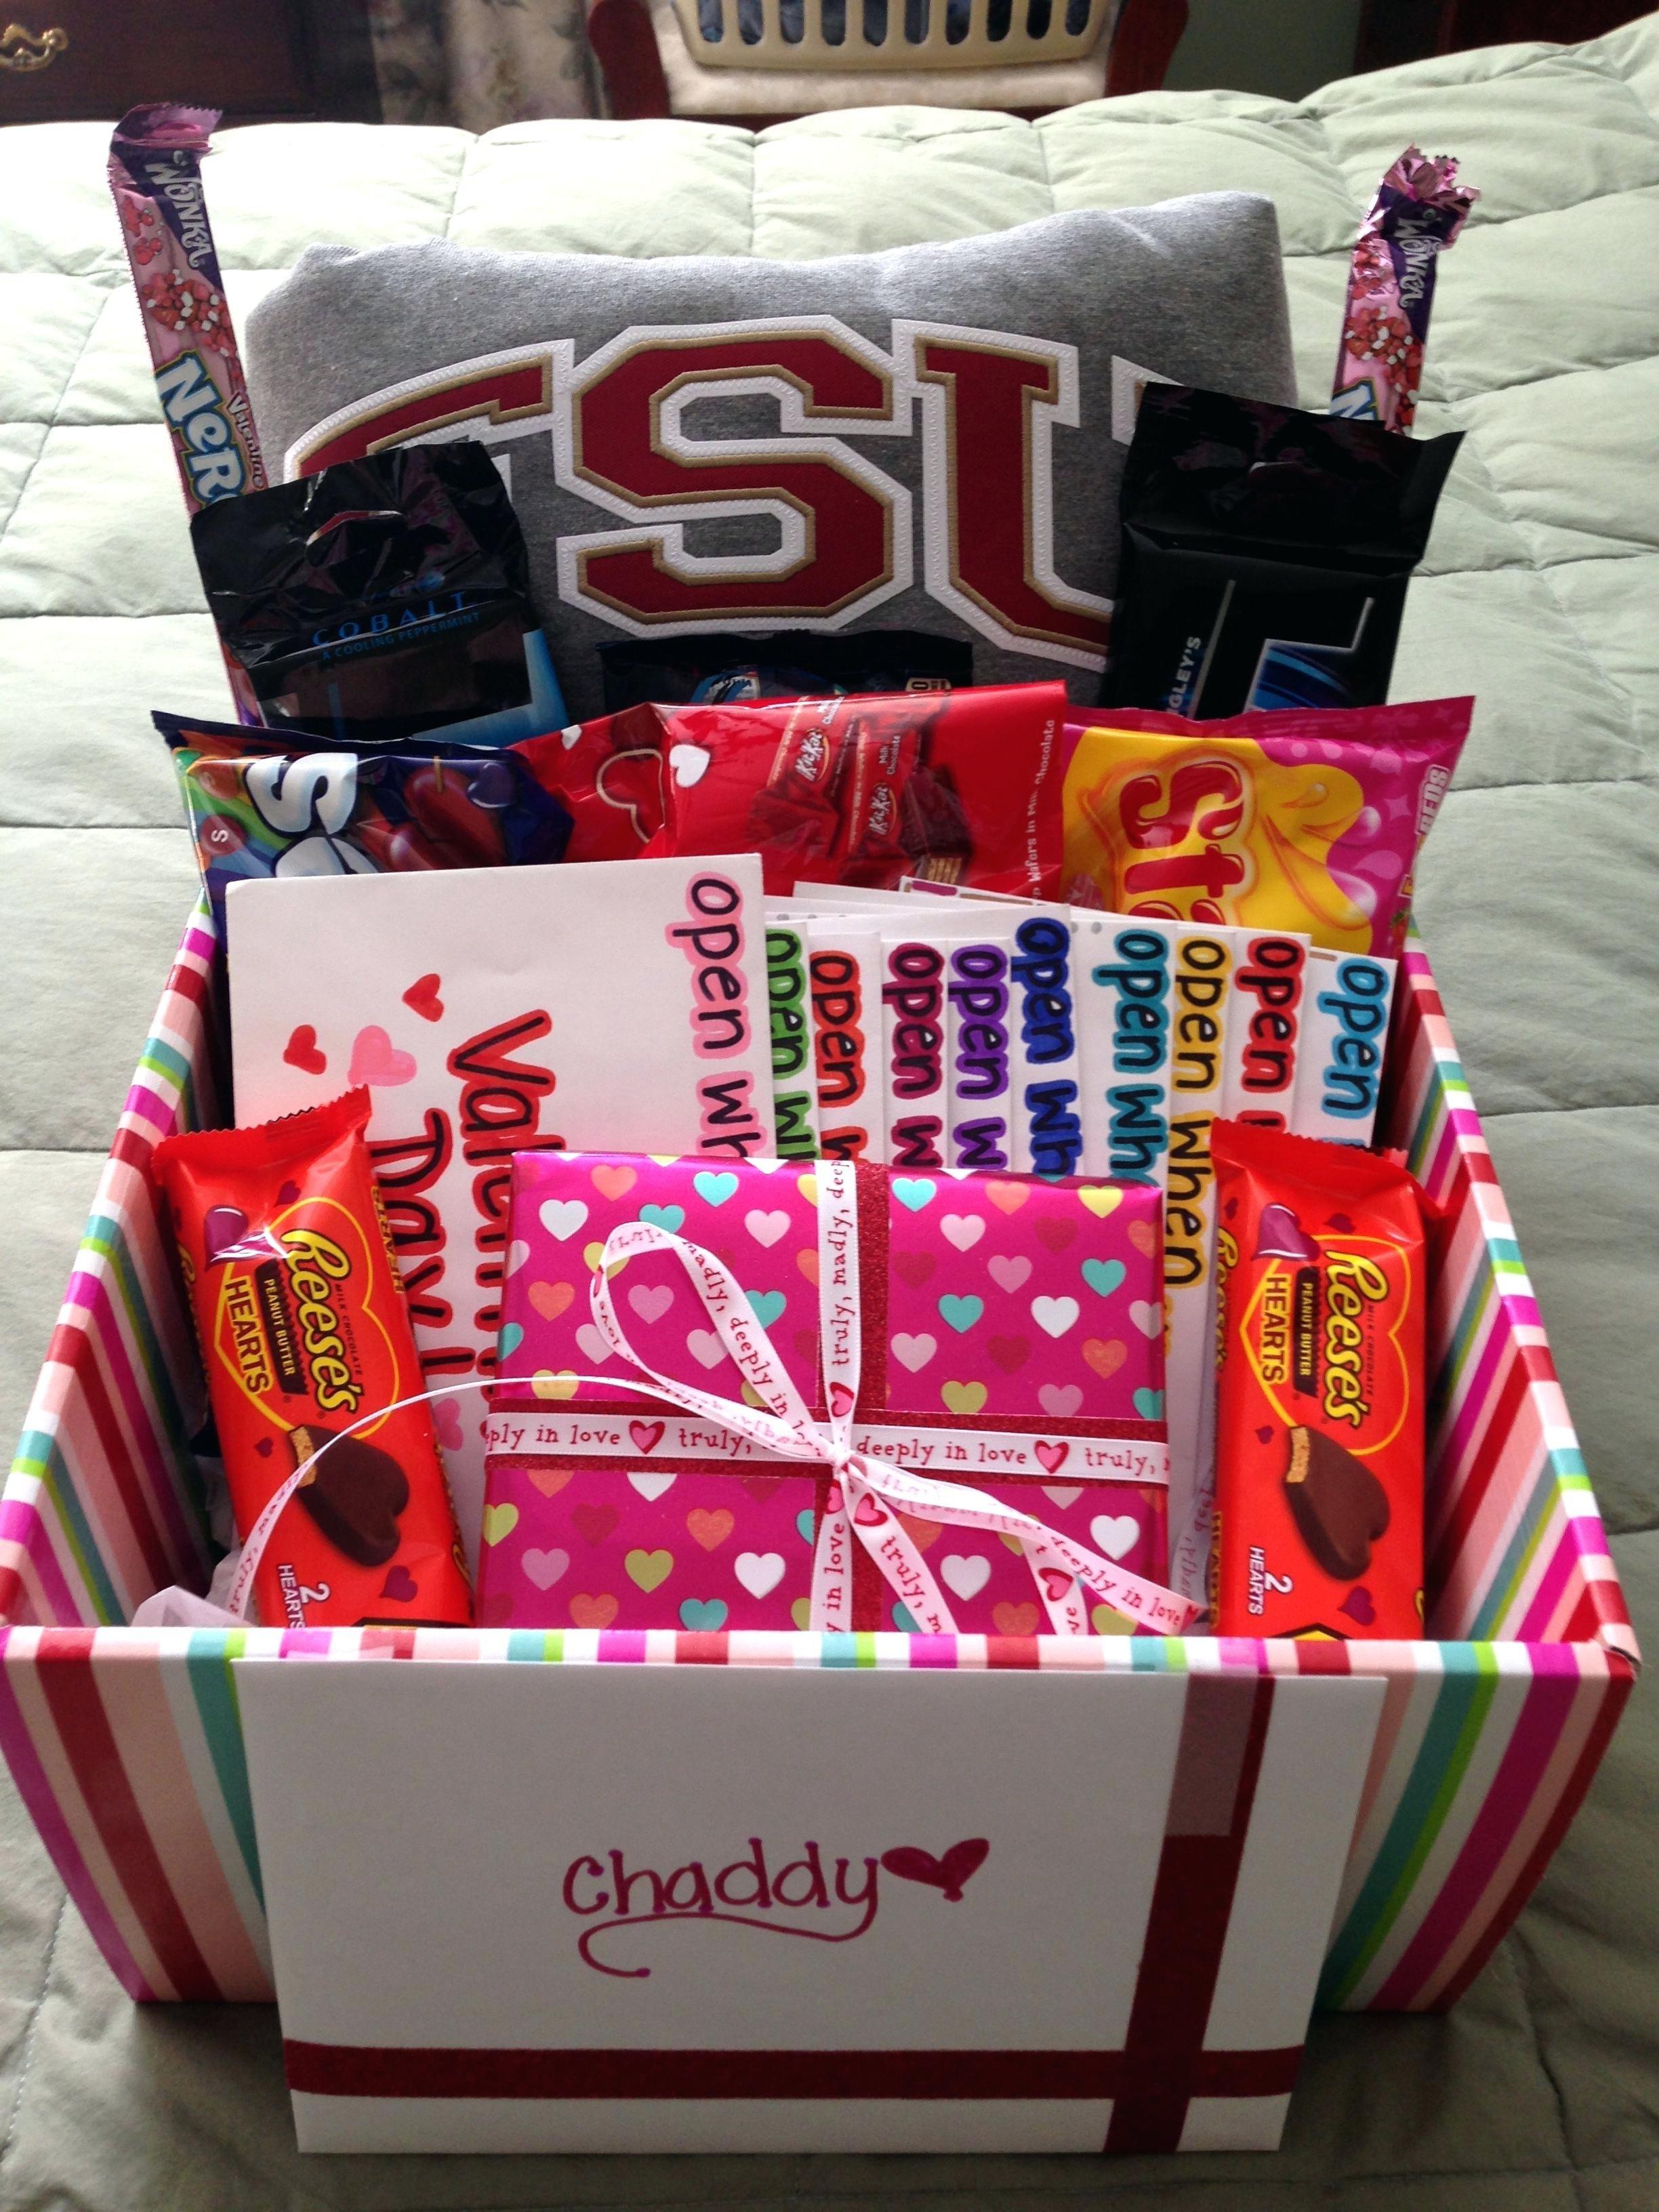 10 Famous Valentines For Him Gift Ideas unique valentine day gifts for him s valentines pinterest best 2016 2020